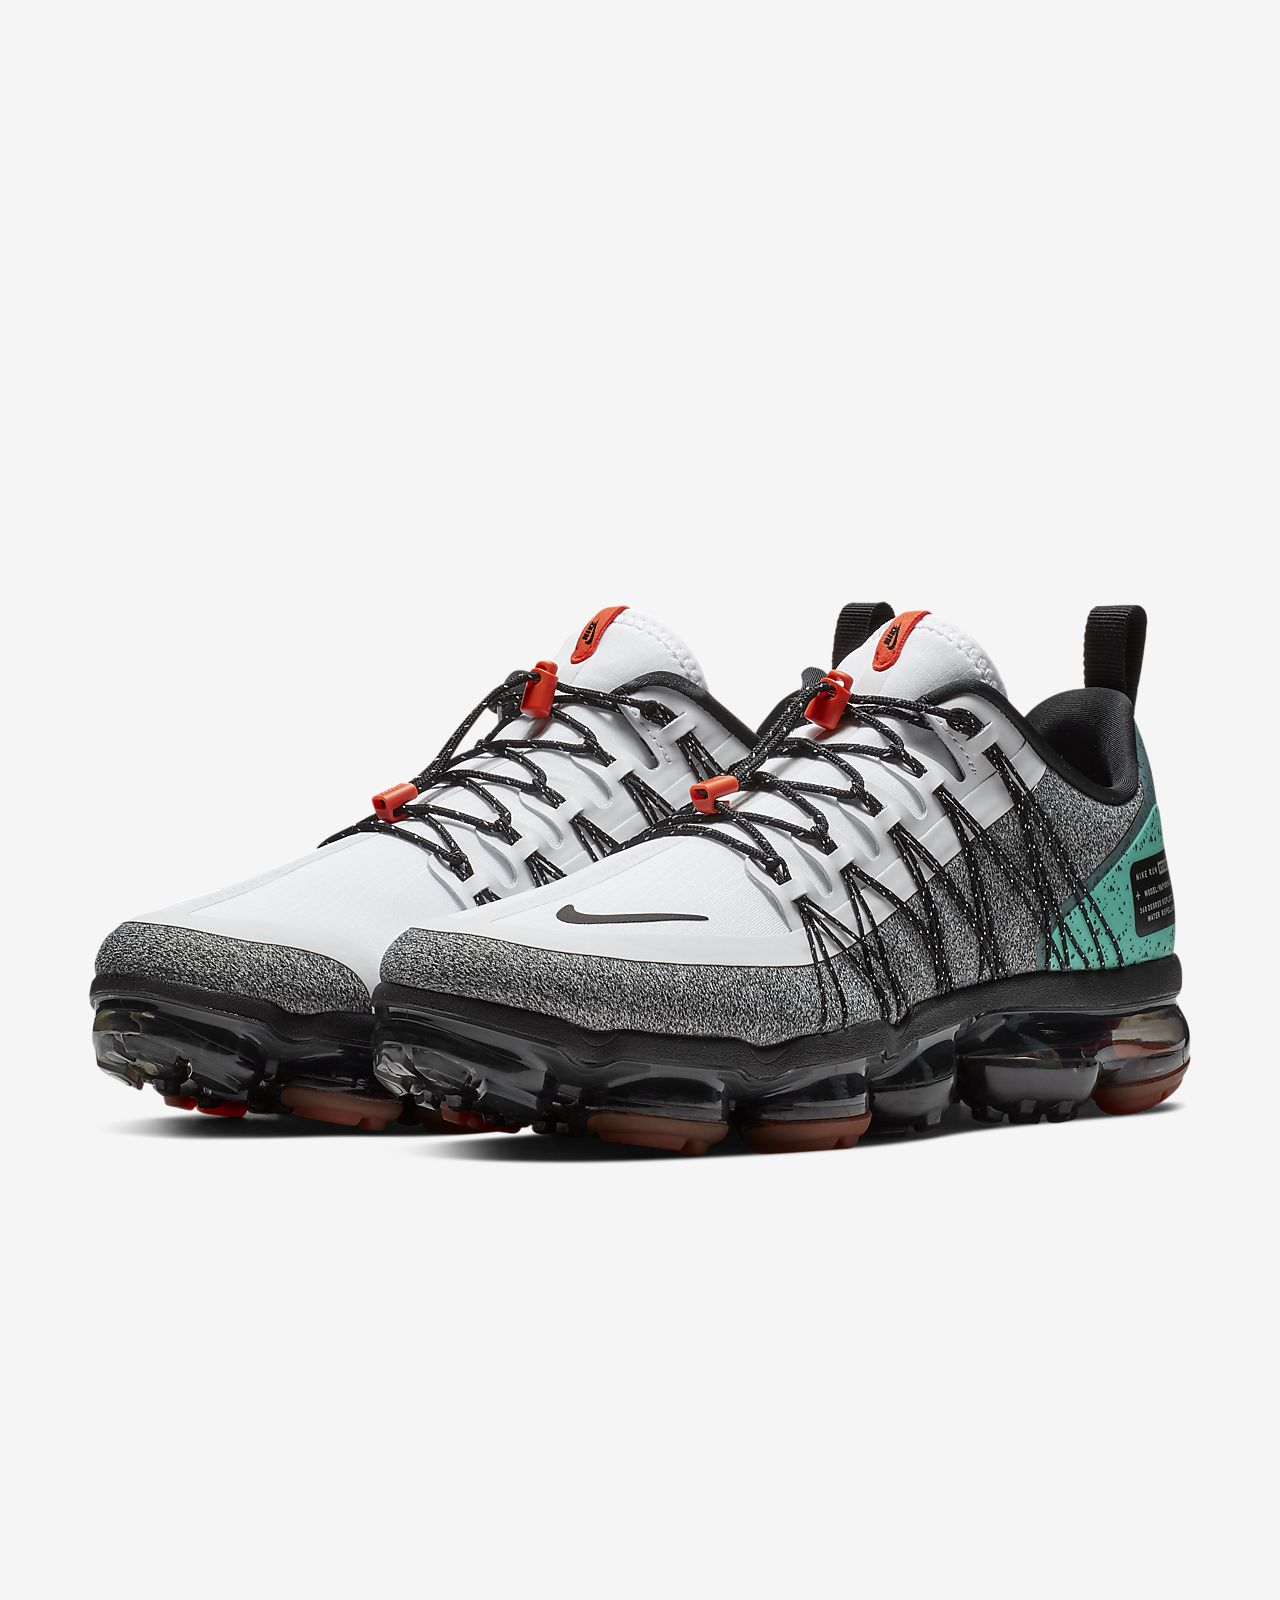 hot sale online 8332b aea20 ... Chaussure Nike Air VaporMax Utility pour Homme